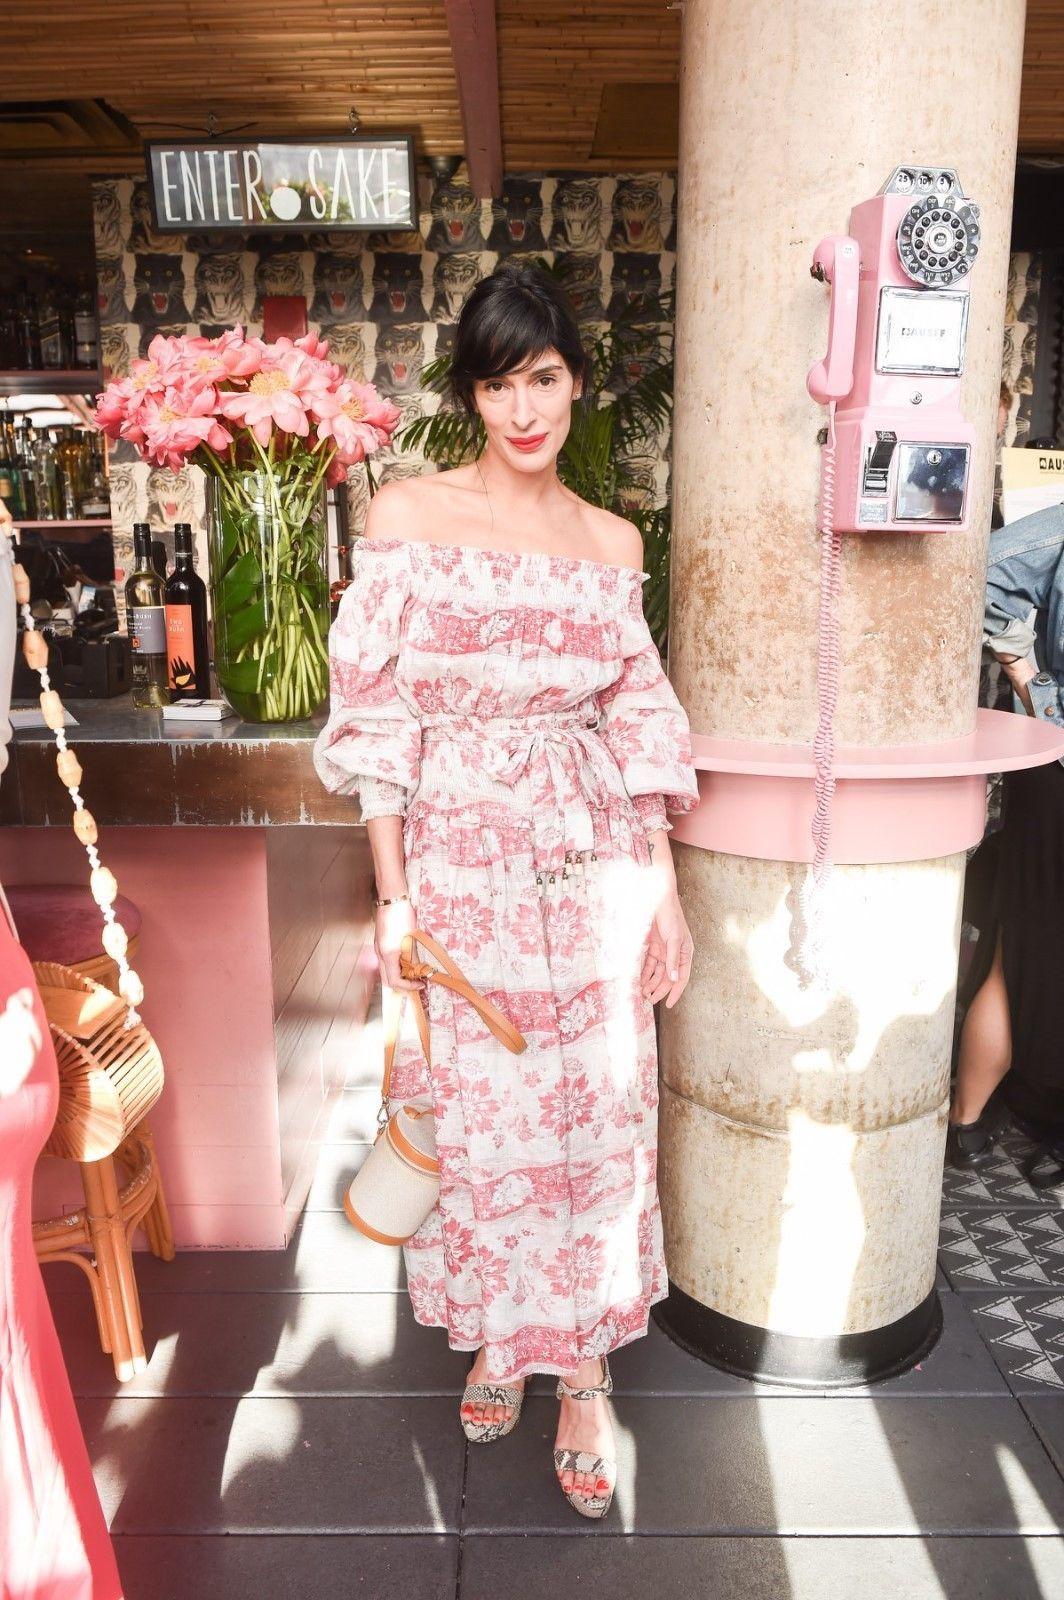 Details about Zimmermann Veneto Plunge Short Dress Size 0